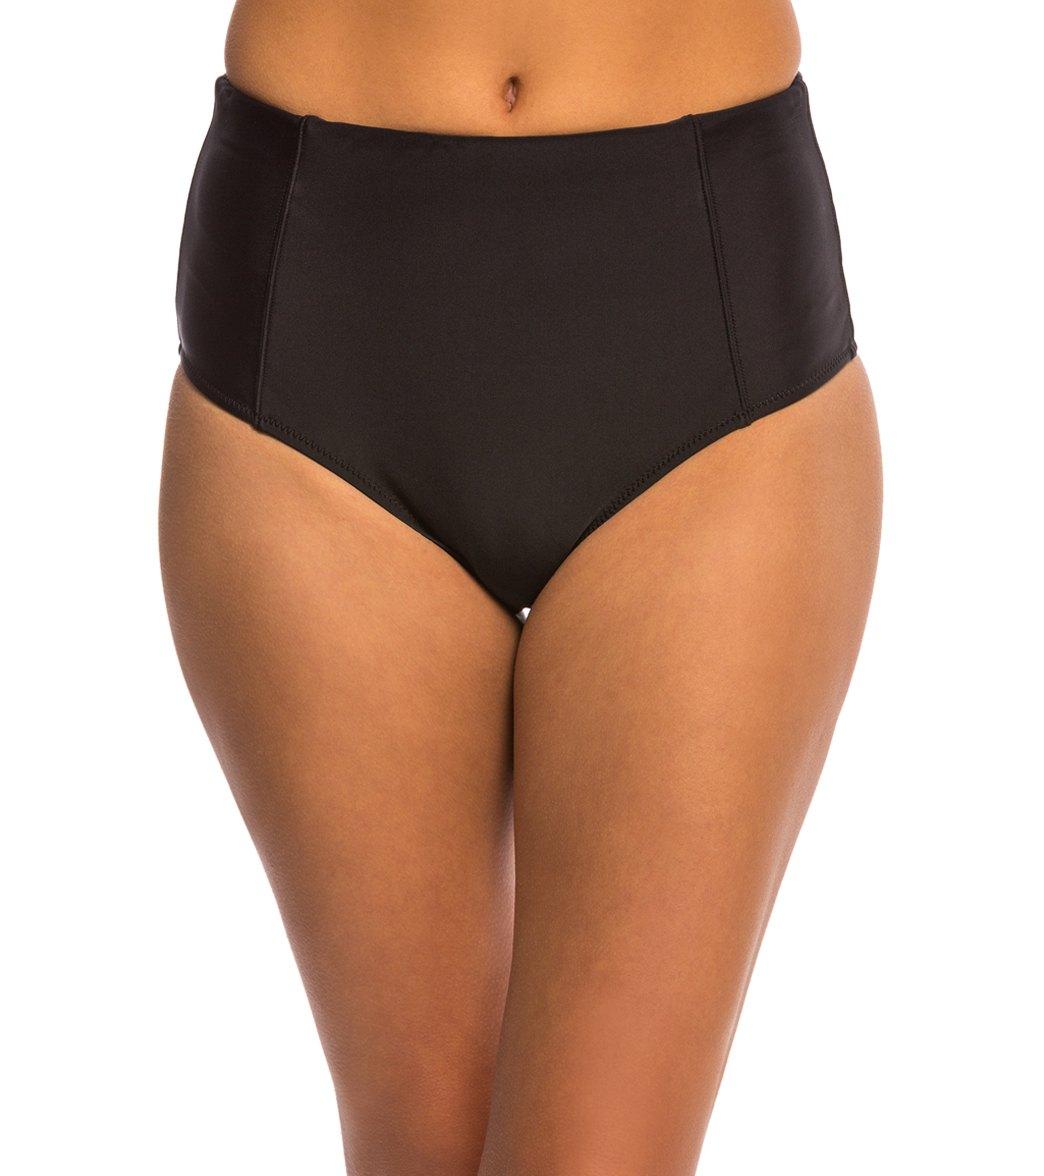 ac49b8e63c Volcom Swimwear Simply Solid Retro Bikini Bottom at SwimOutlet.com